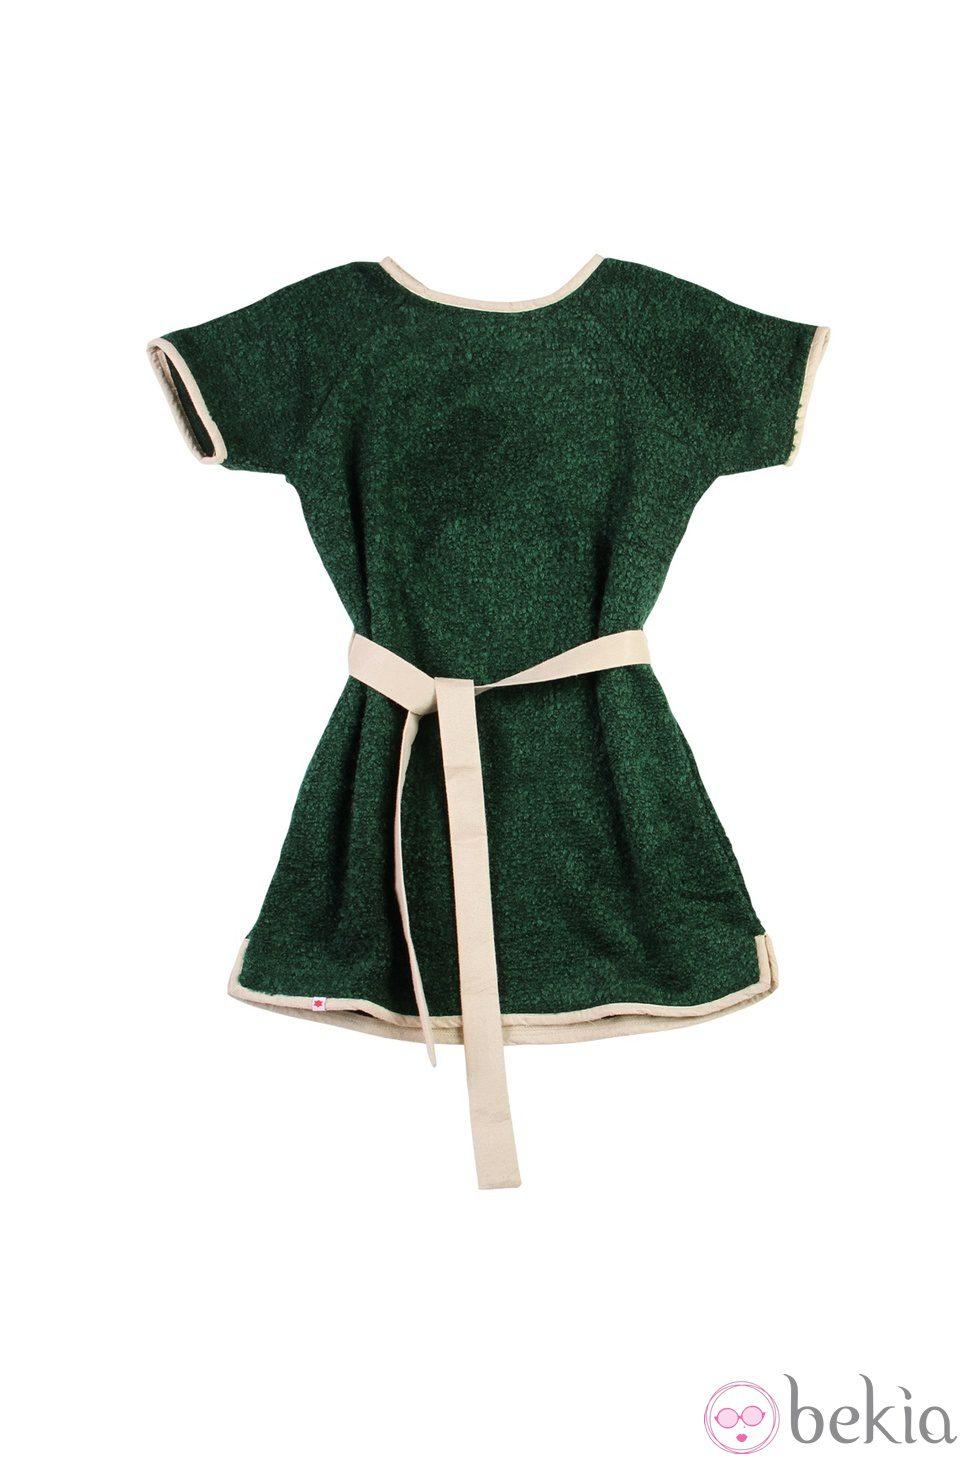 Vestido verde de Kling